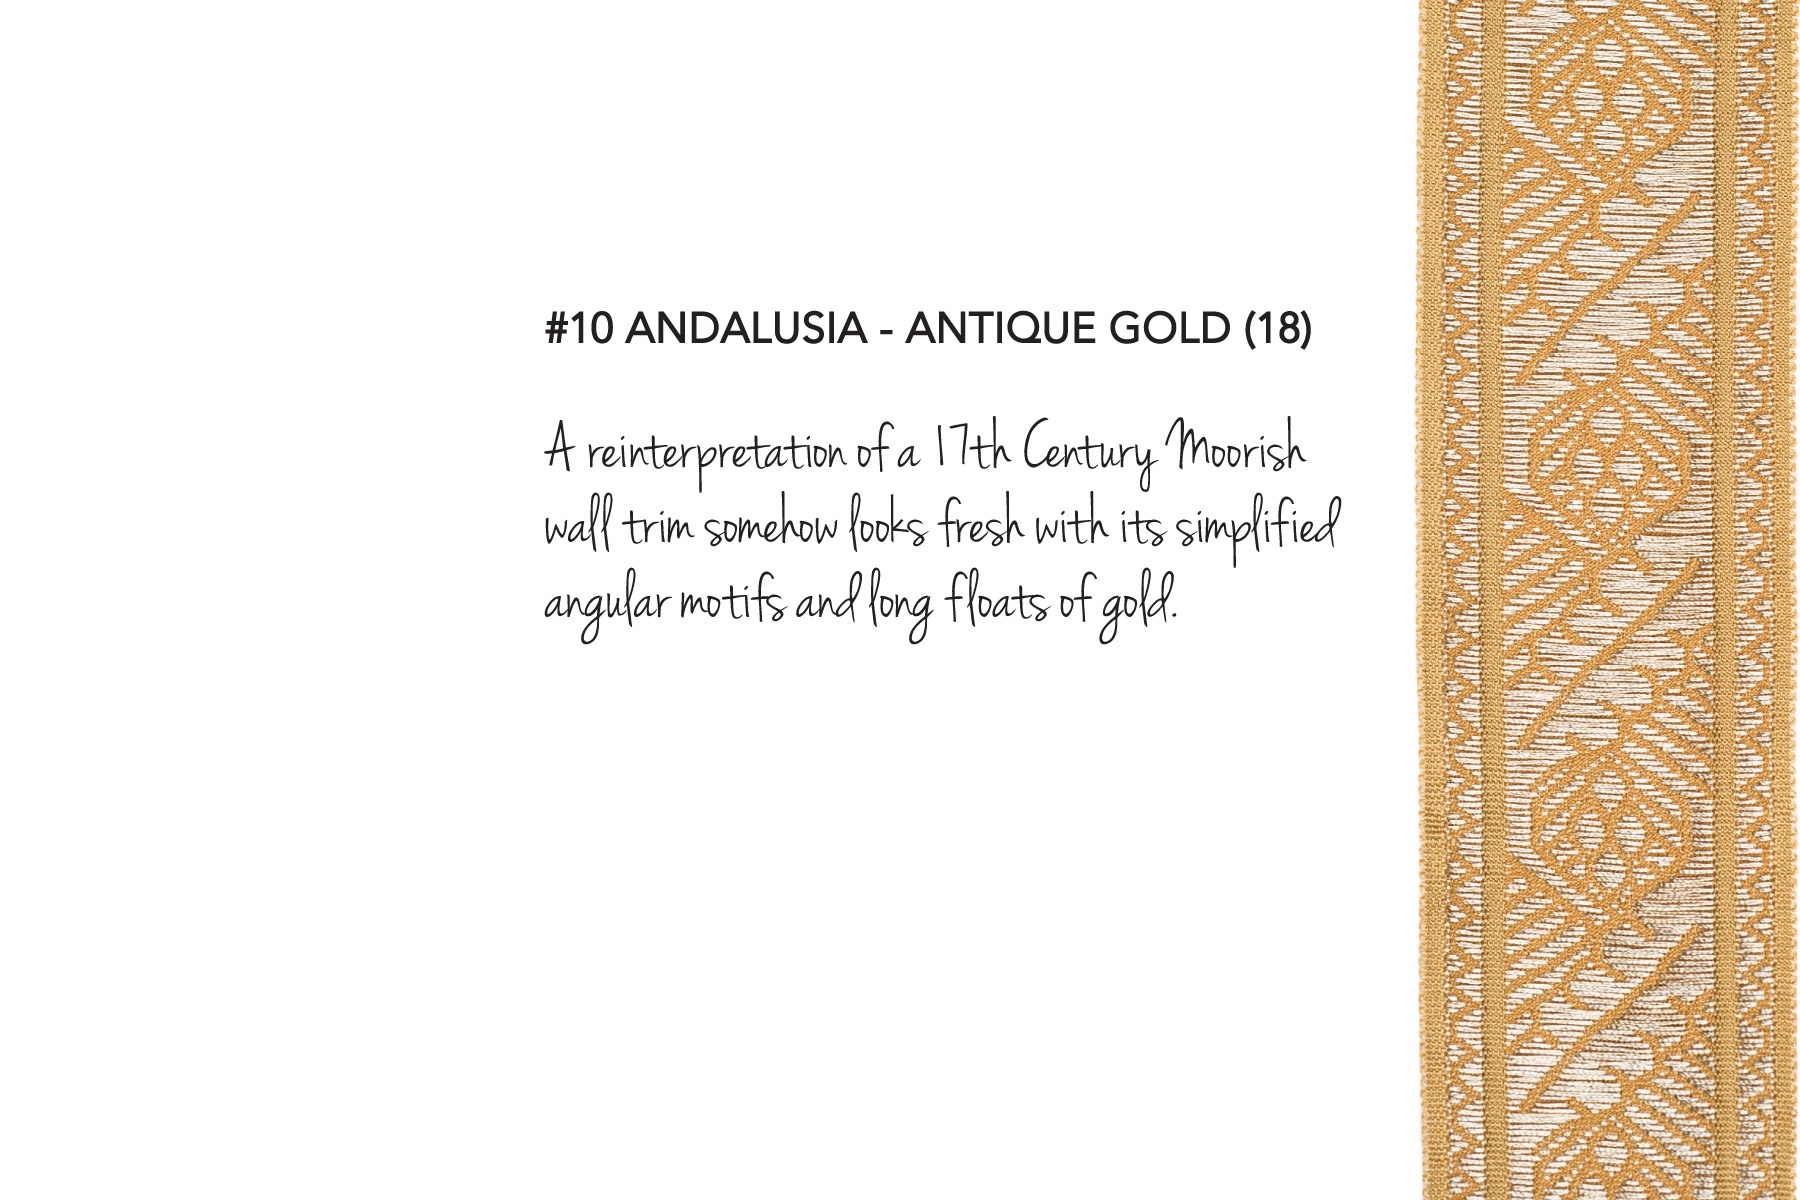 Andalusia_AntiqueGold_#10